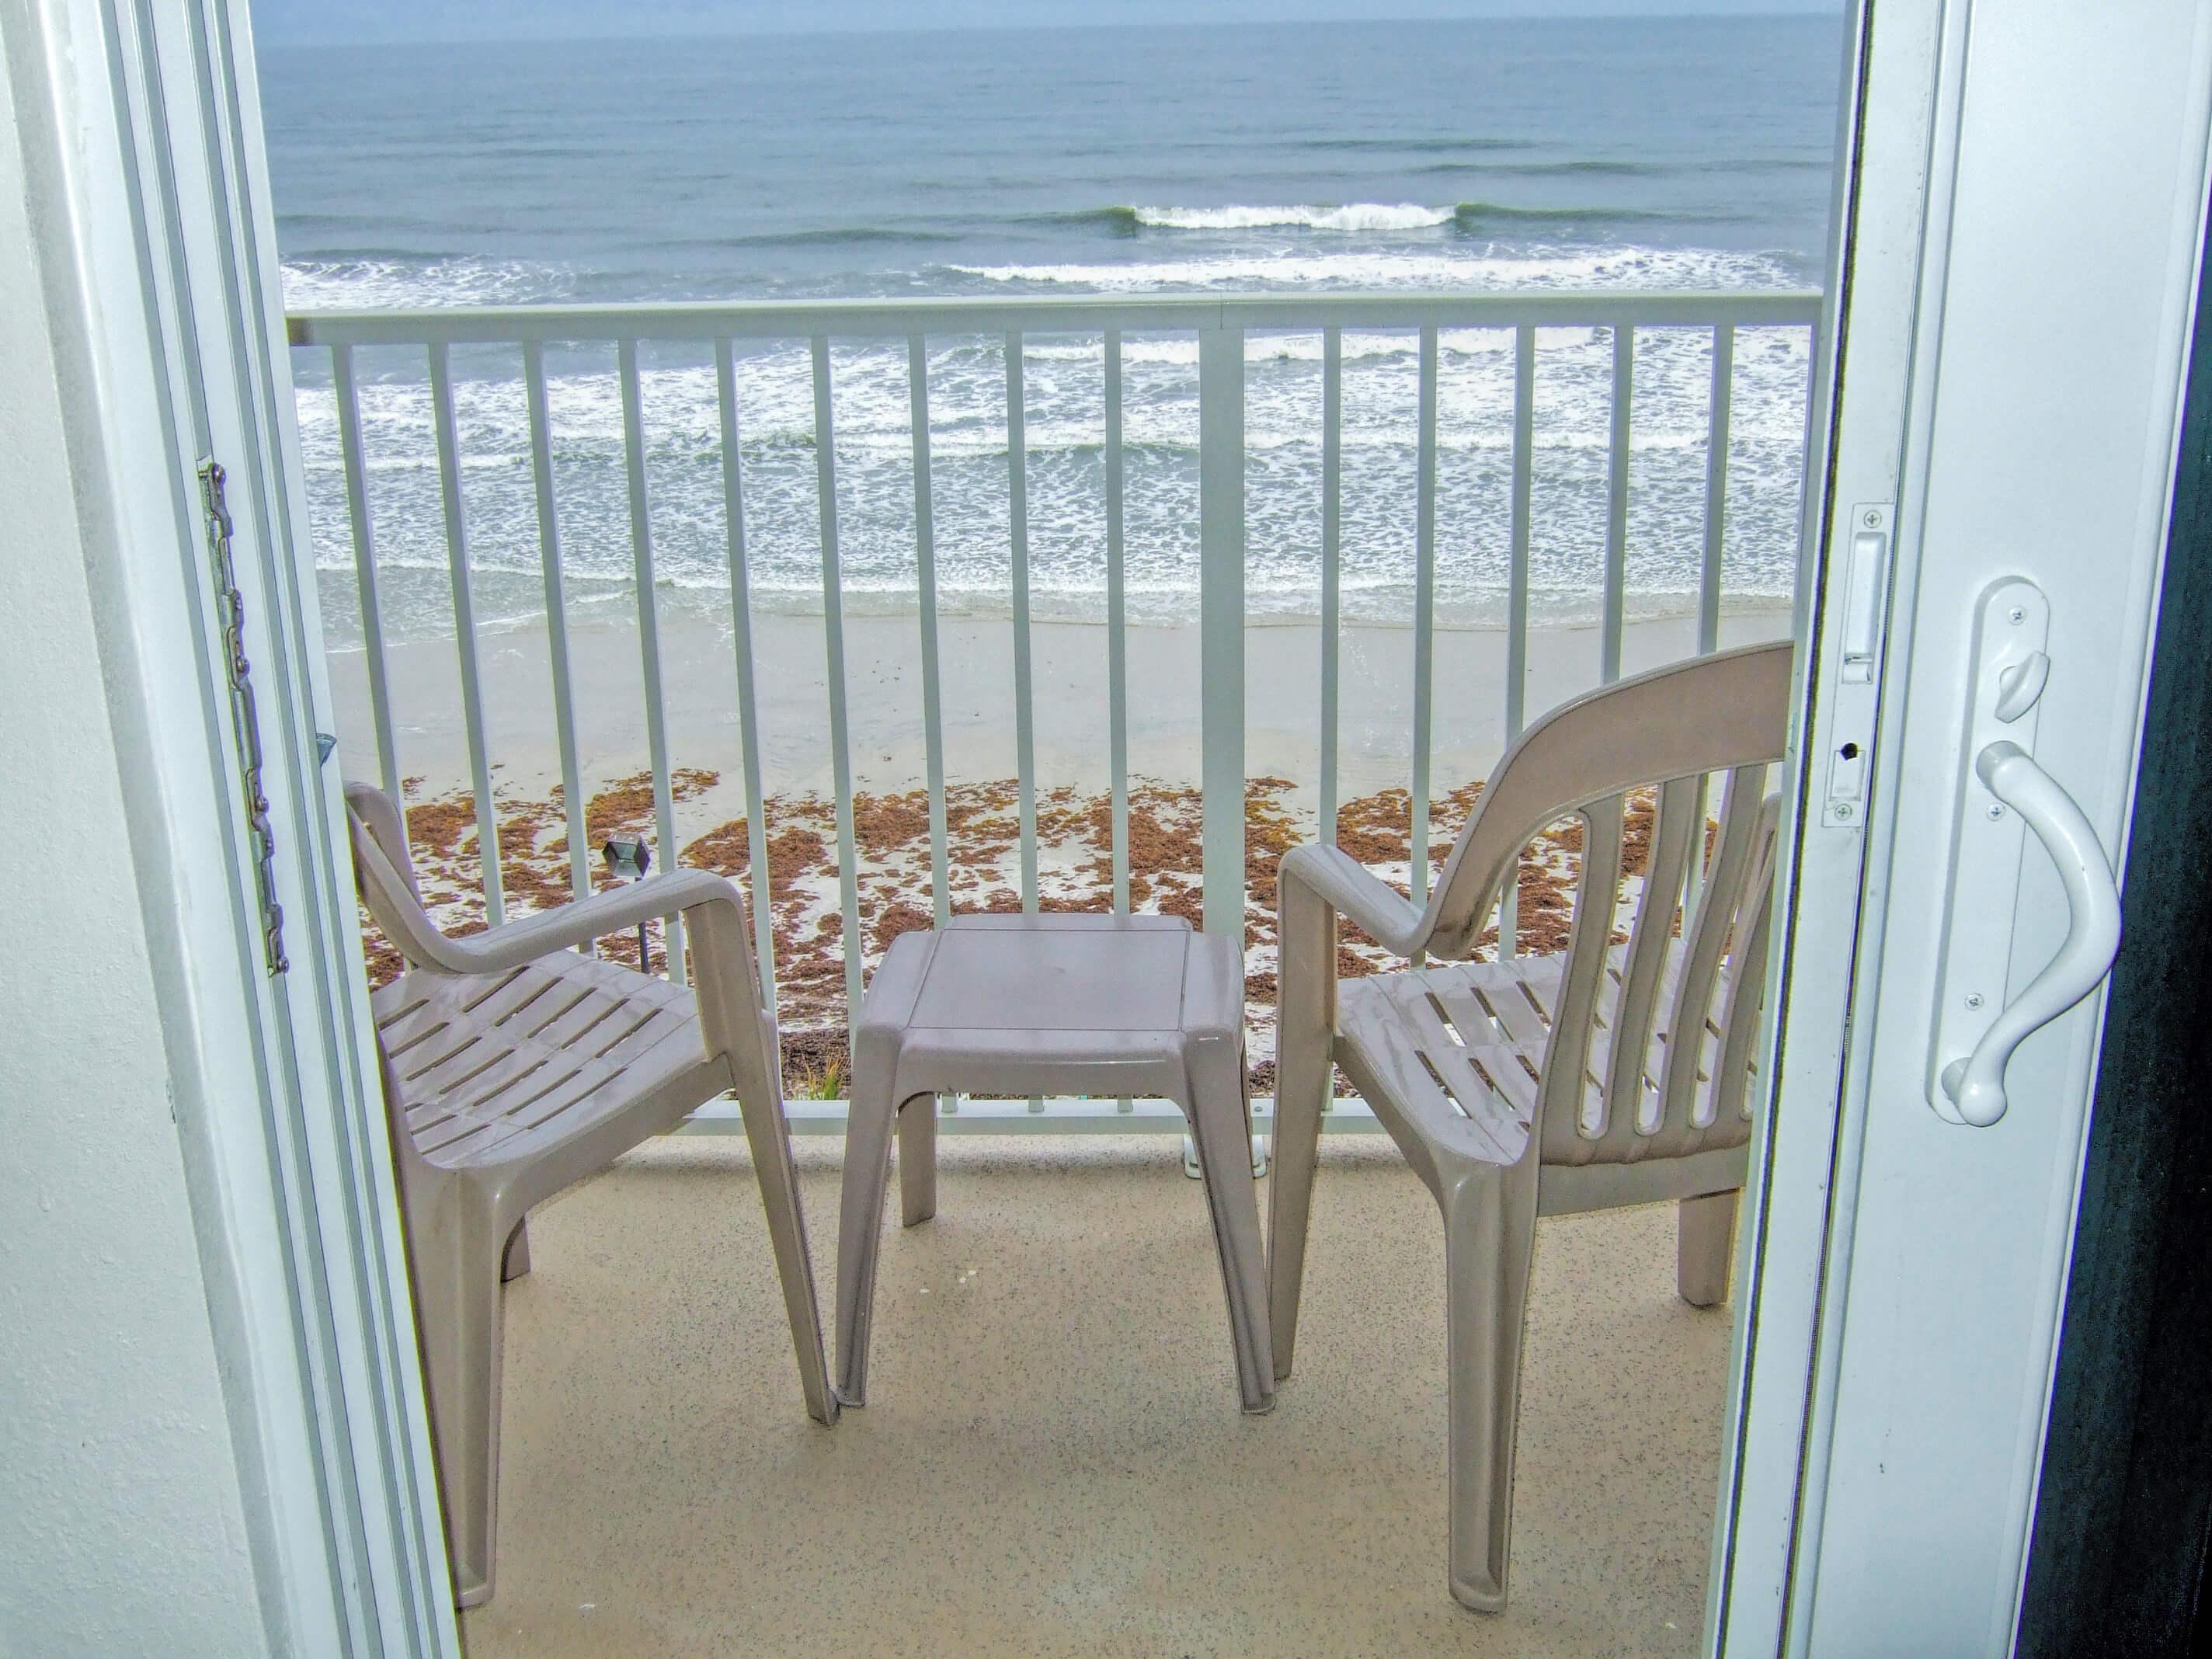 One-Bedroom Villa with Private Balcony | Harbour Beach Resort | Westgate Resorts in Daytona Beach, FL